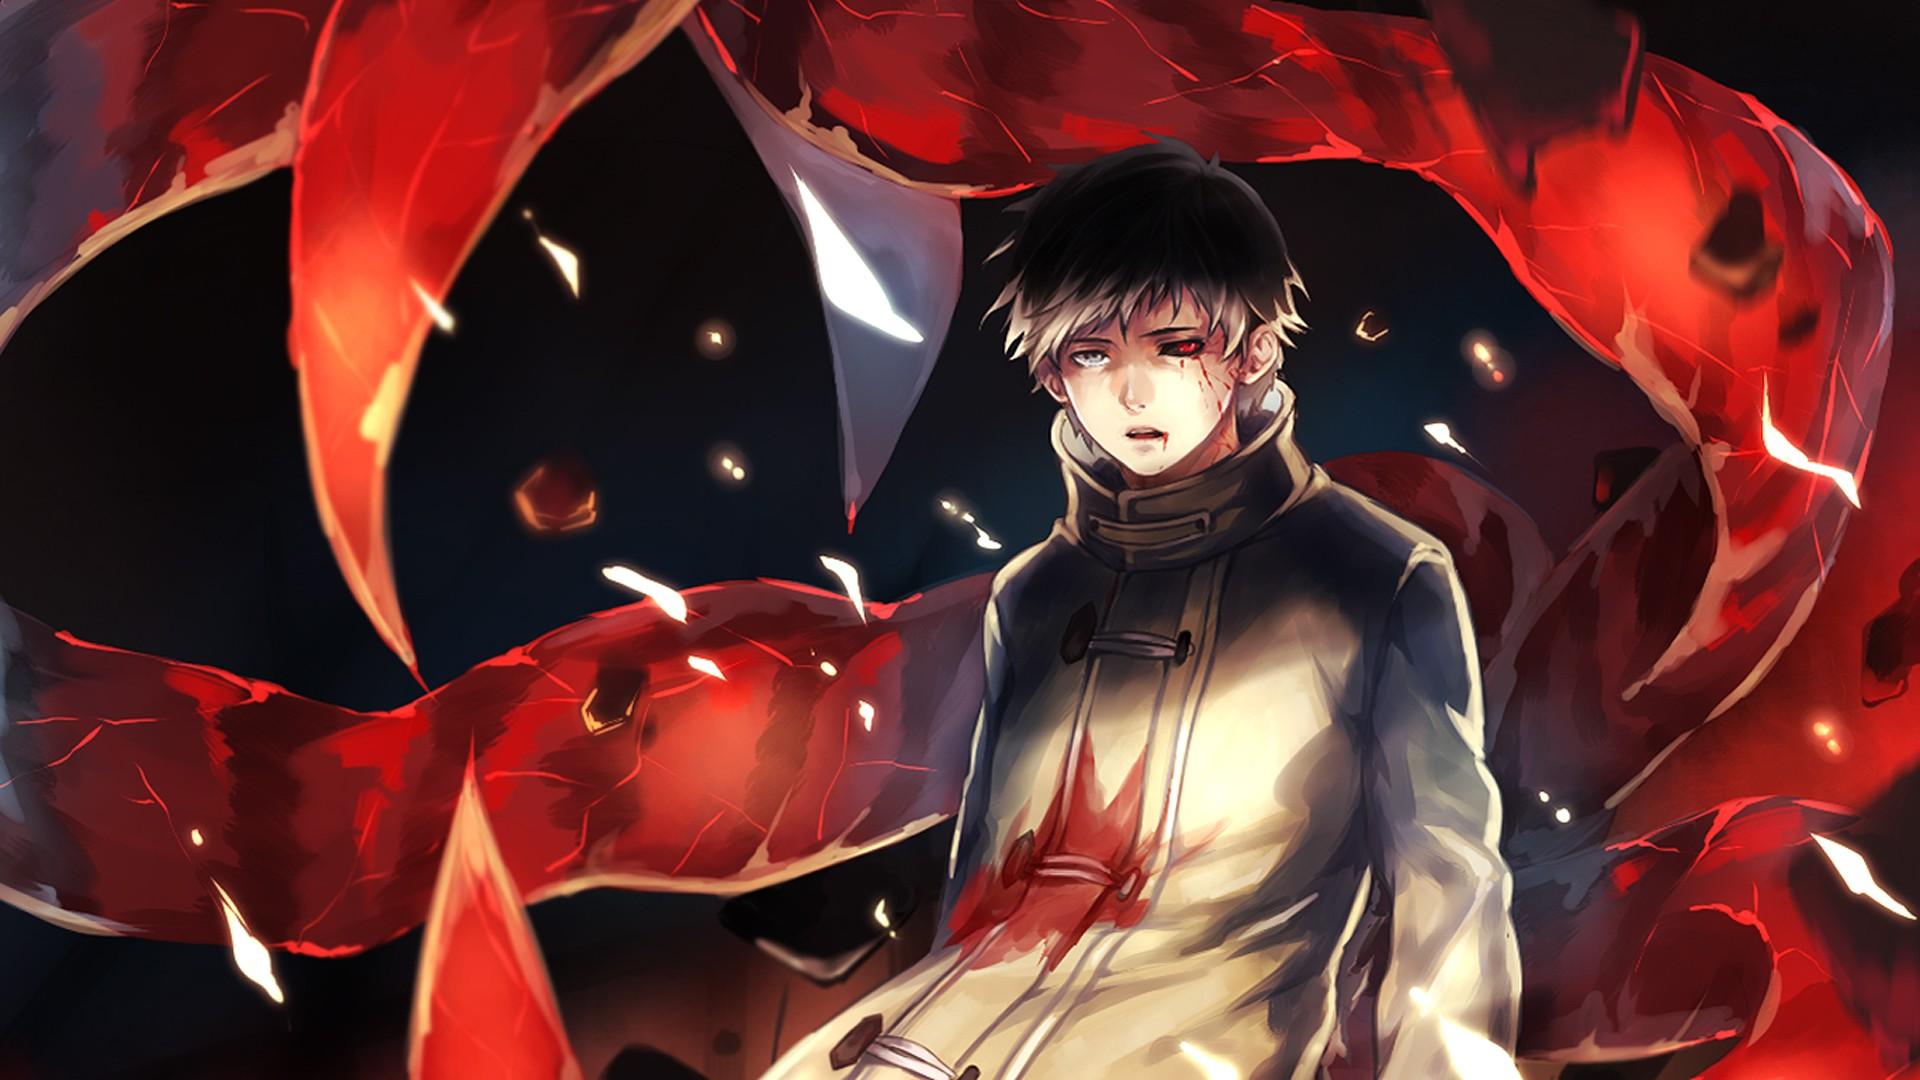 Wallpaper : illustration, anime, red, superhero, Kaneki ...